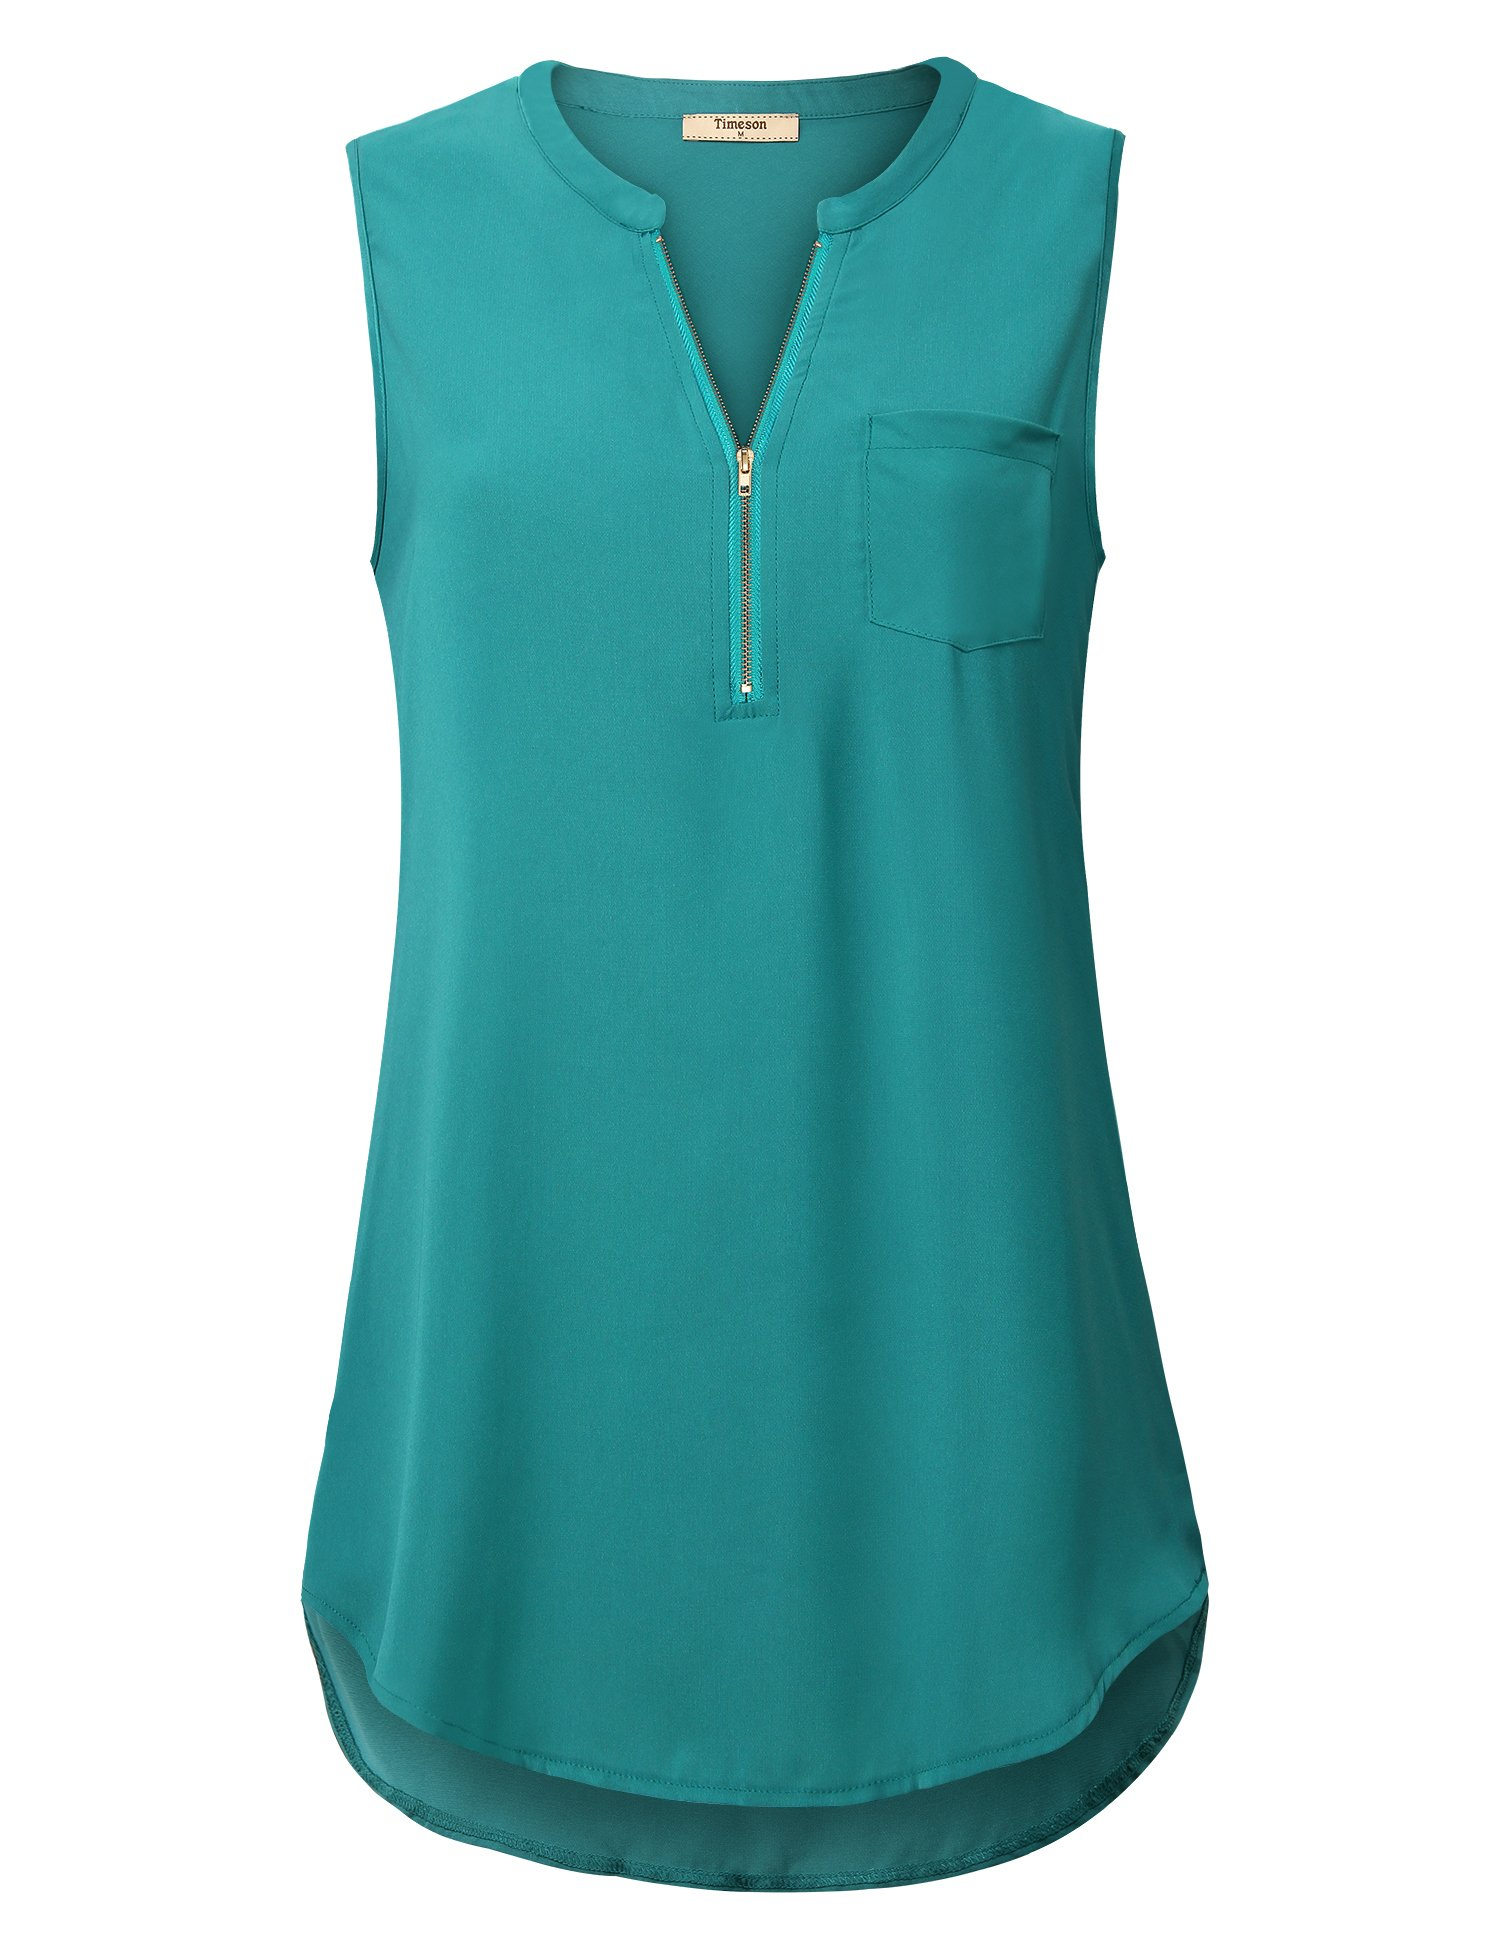 Timeson Sleeveless Tunics for Women, Ladies Chiffon Blouses V Neck Cute Casual Tank Tops Sleeveless Loose Fit Summer Zipper Tunics Tops for Office Wear Deep Cyan Medium